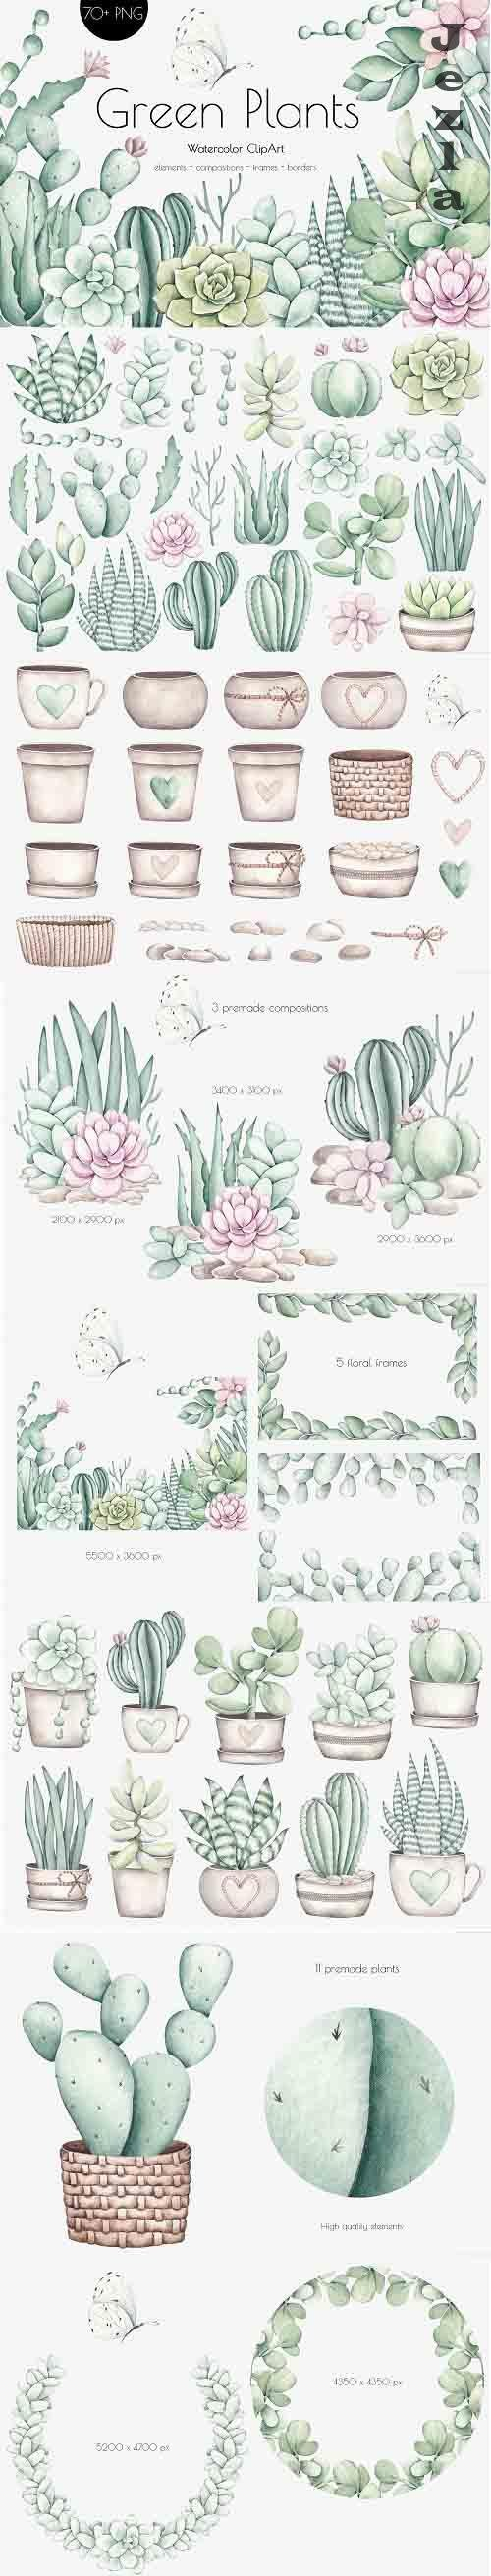 Watercolor ClipArt Green Plants - 1354890